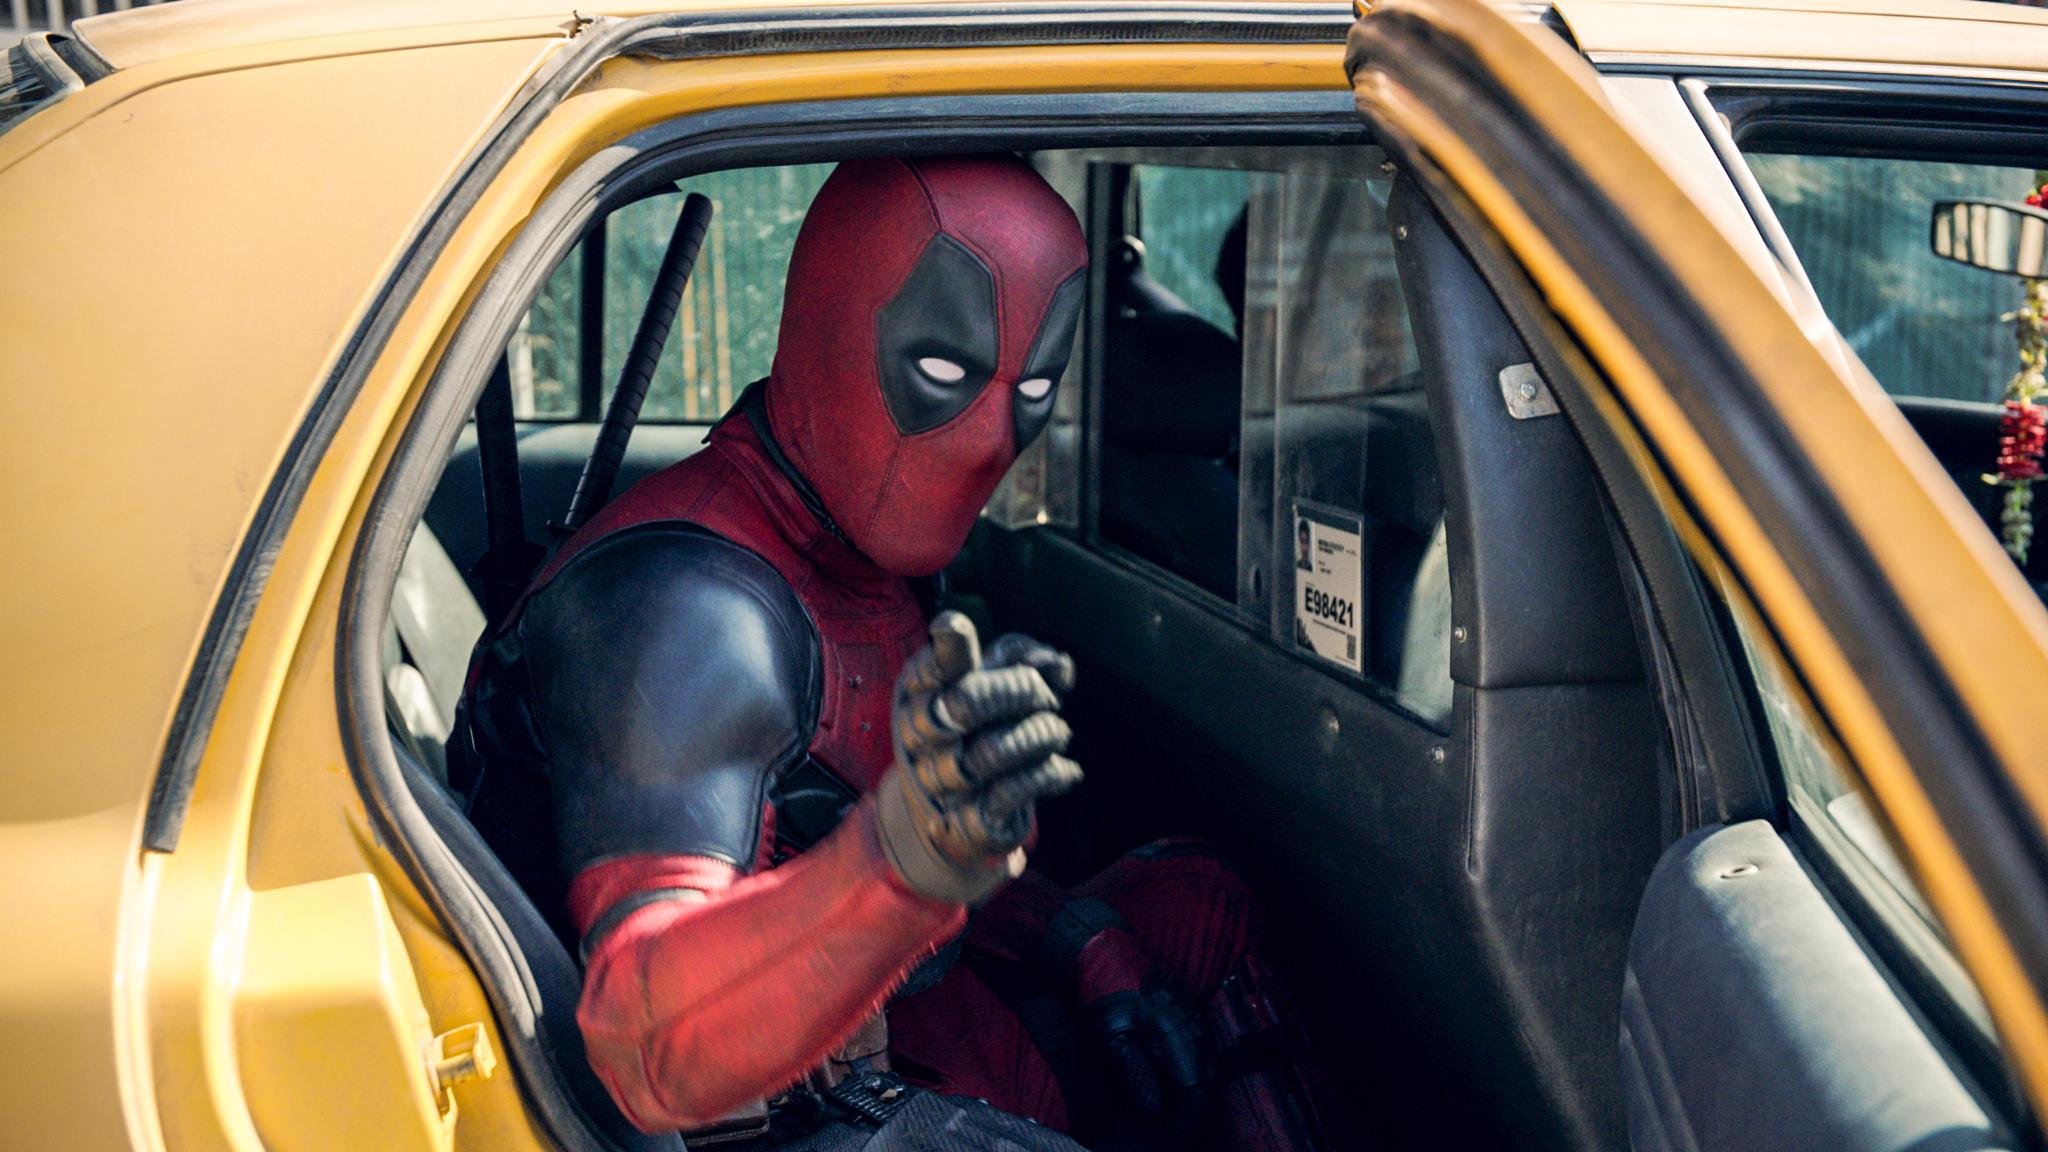 Ryan Reynolds in Deadpool (2016)